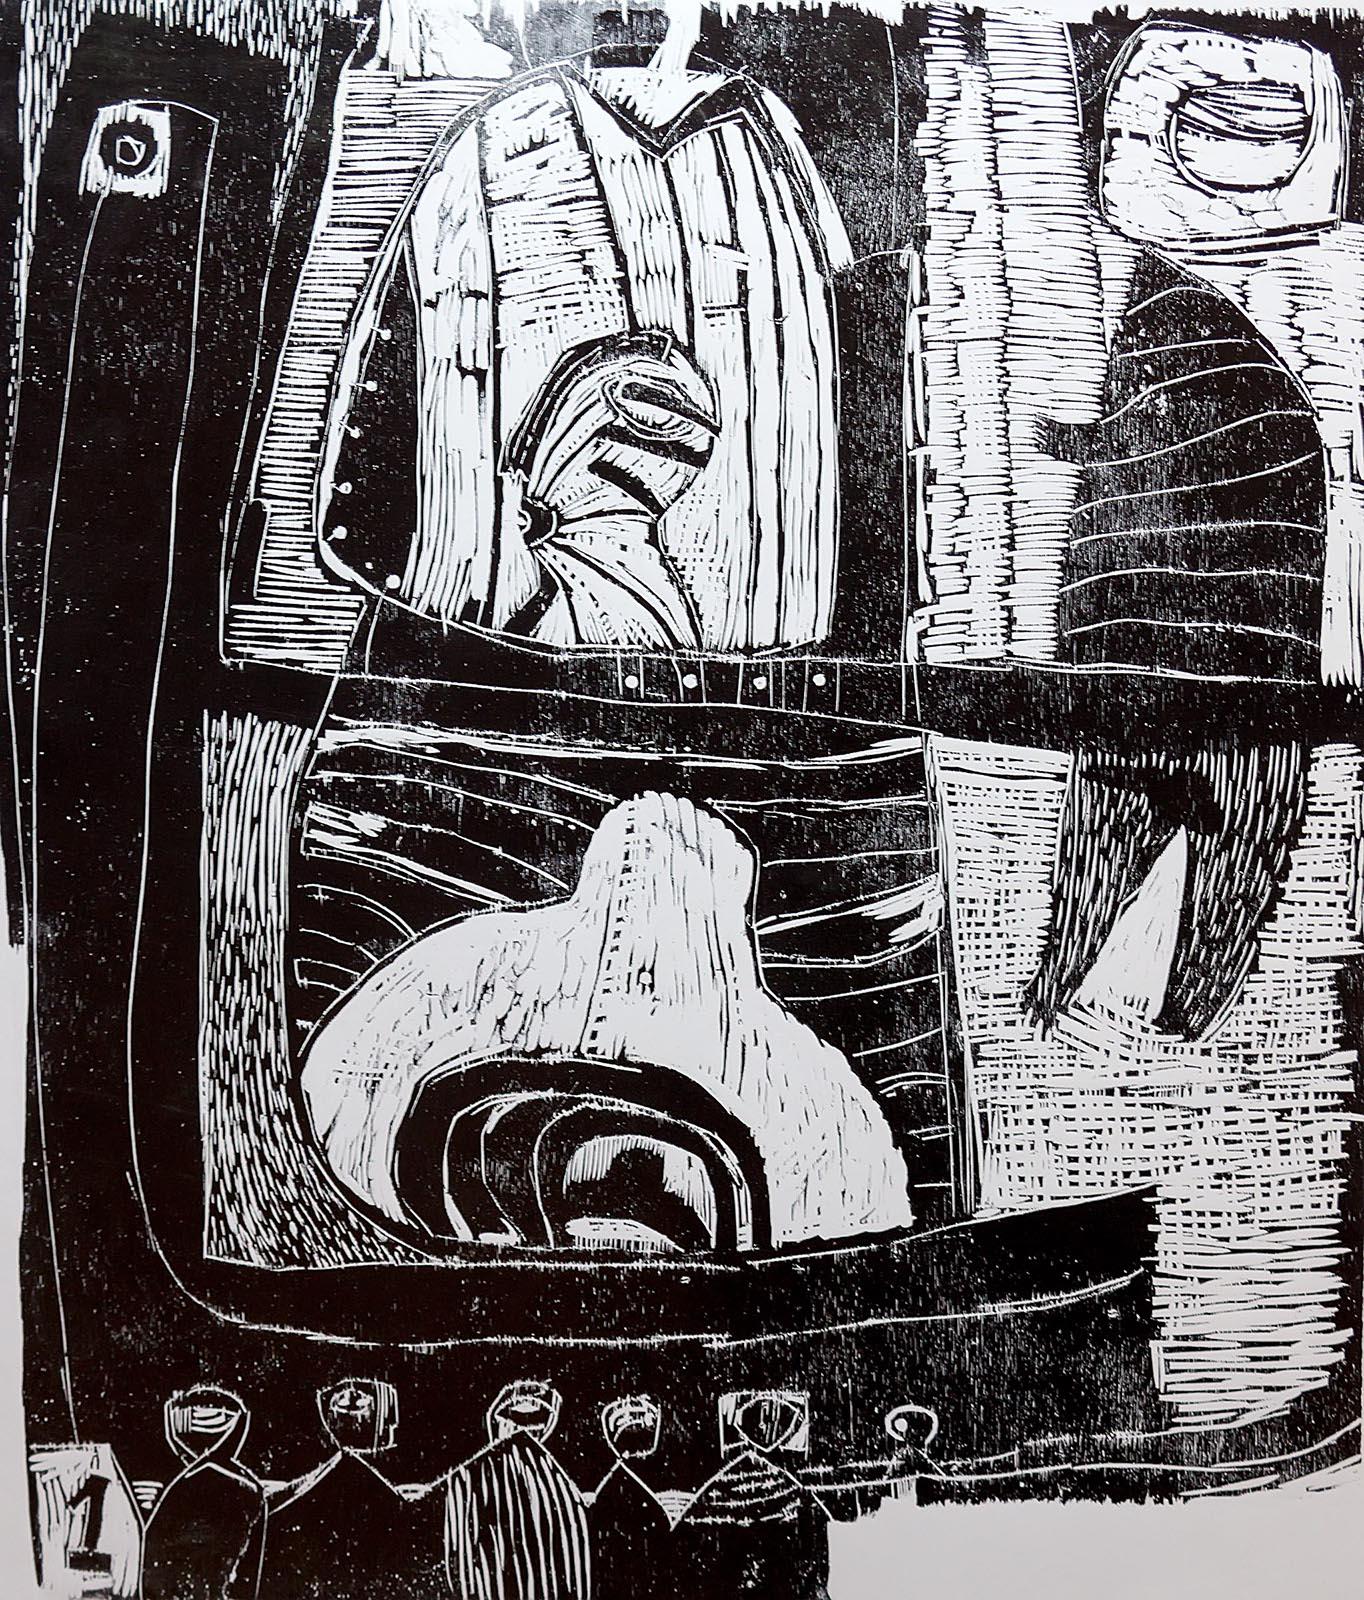 Фото №203665. ТЕРЕГУЛОВ АЙРАТ РАУФОВИЧ. 1957 Россия, Башкортостан, Уфа МОЁ ИМЯ. ЛИСТ №1. 2003 Бумага, линогравюра